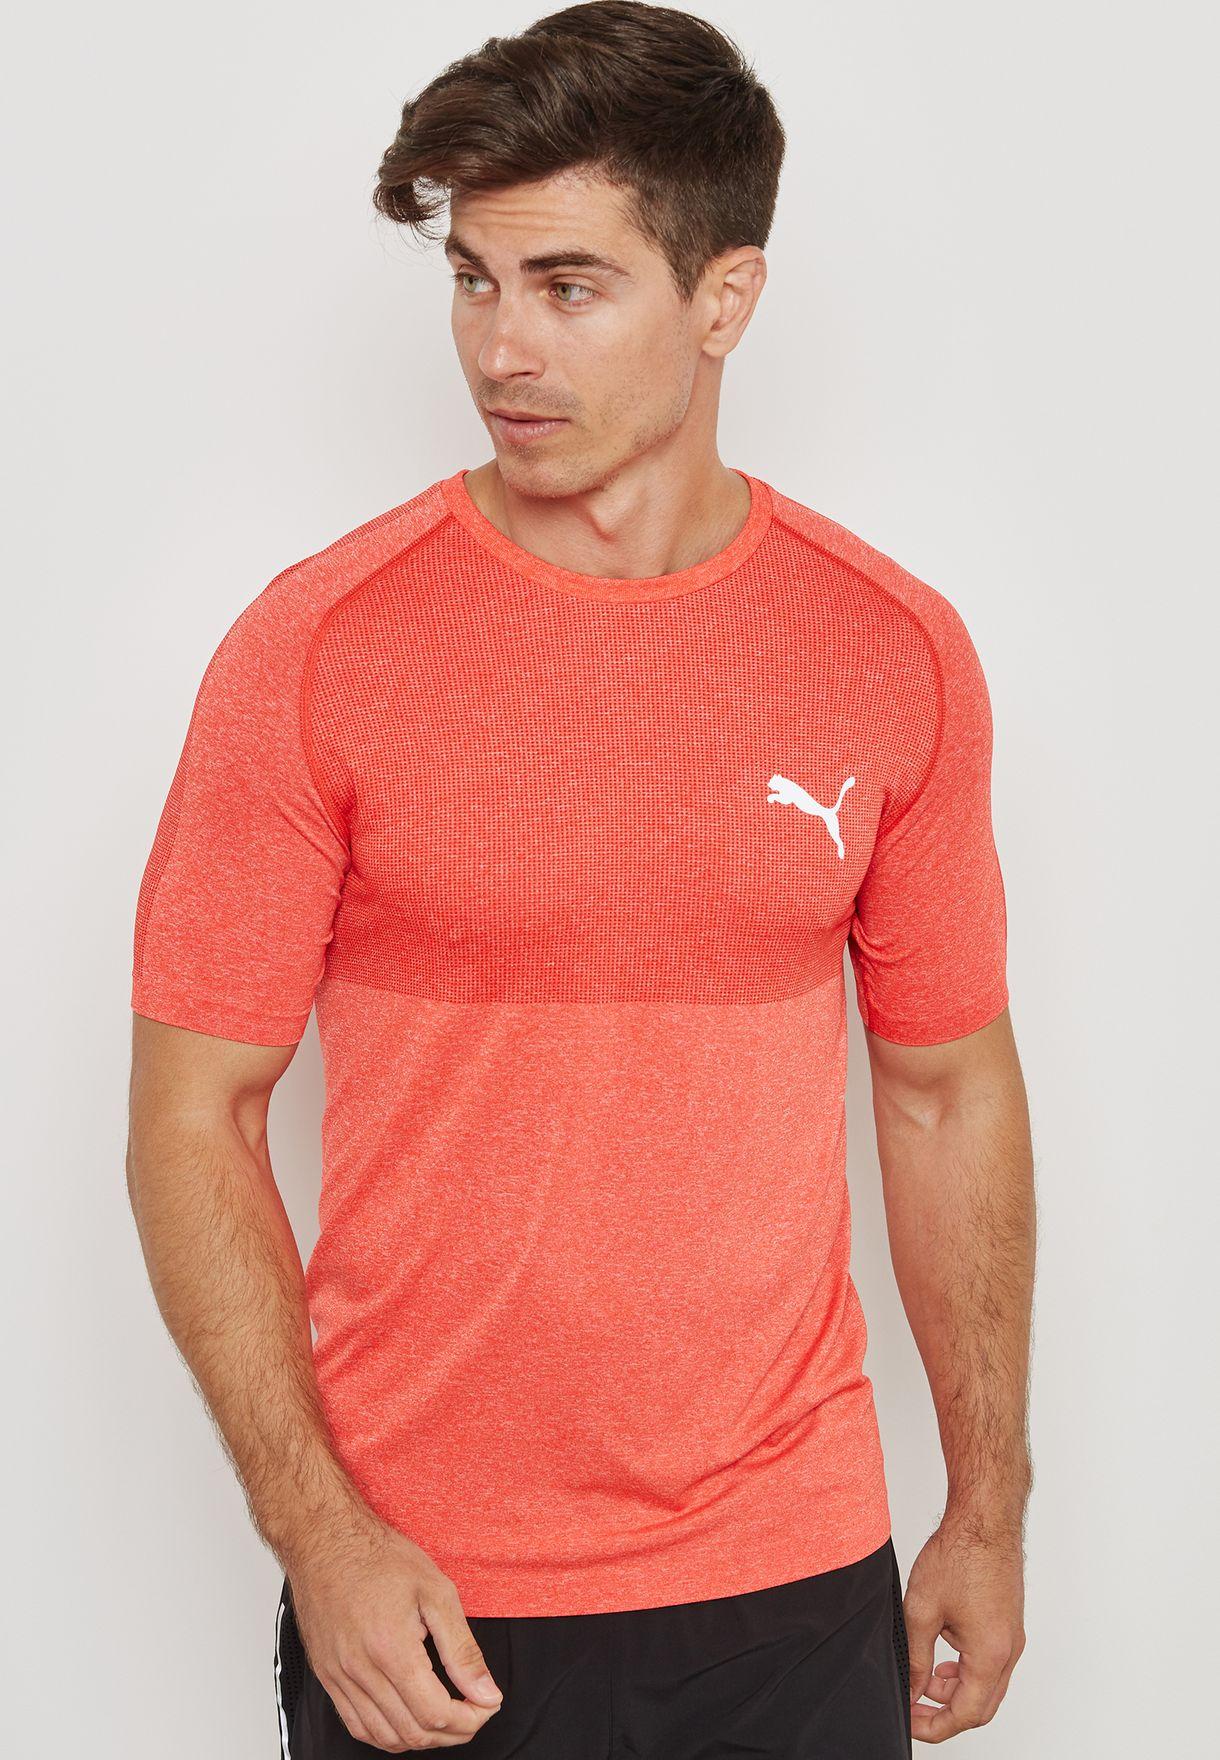 a28bf2007d0 Shop PUMA orange evoKNIT T-Shirt 59509242 for Men in Saudi ...